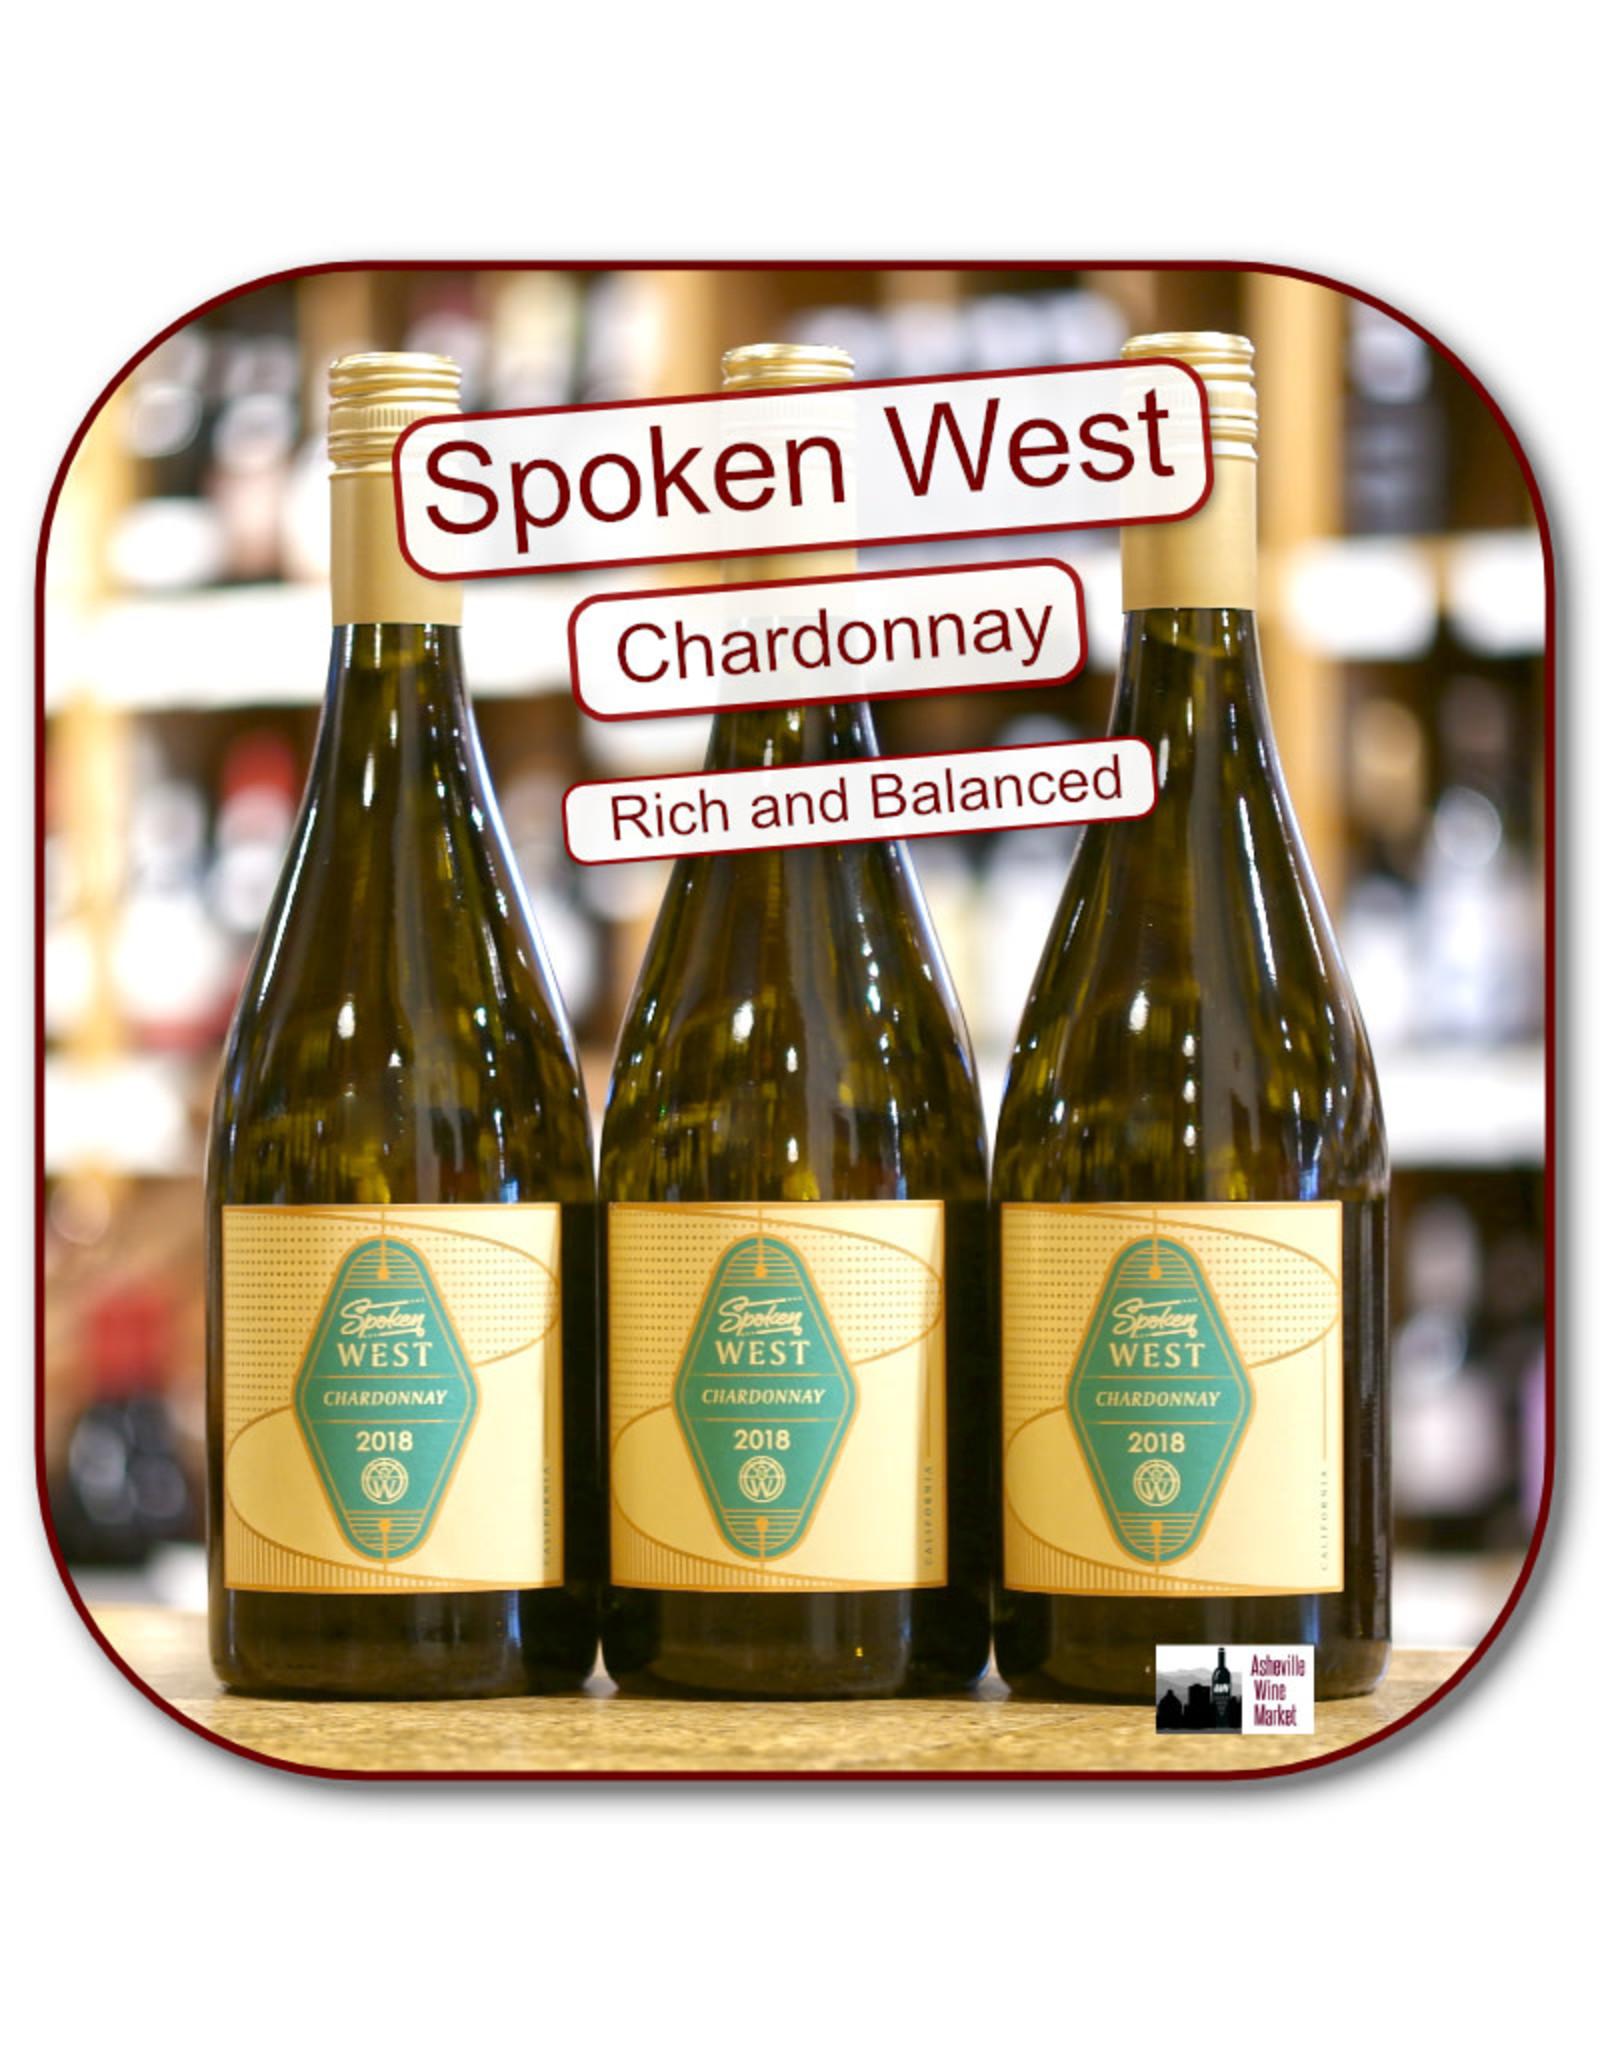 Chardonnay Spoken West Chardonnay 18